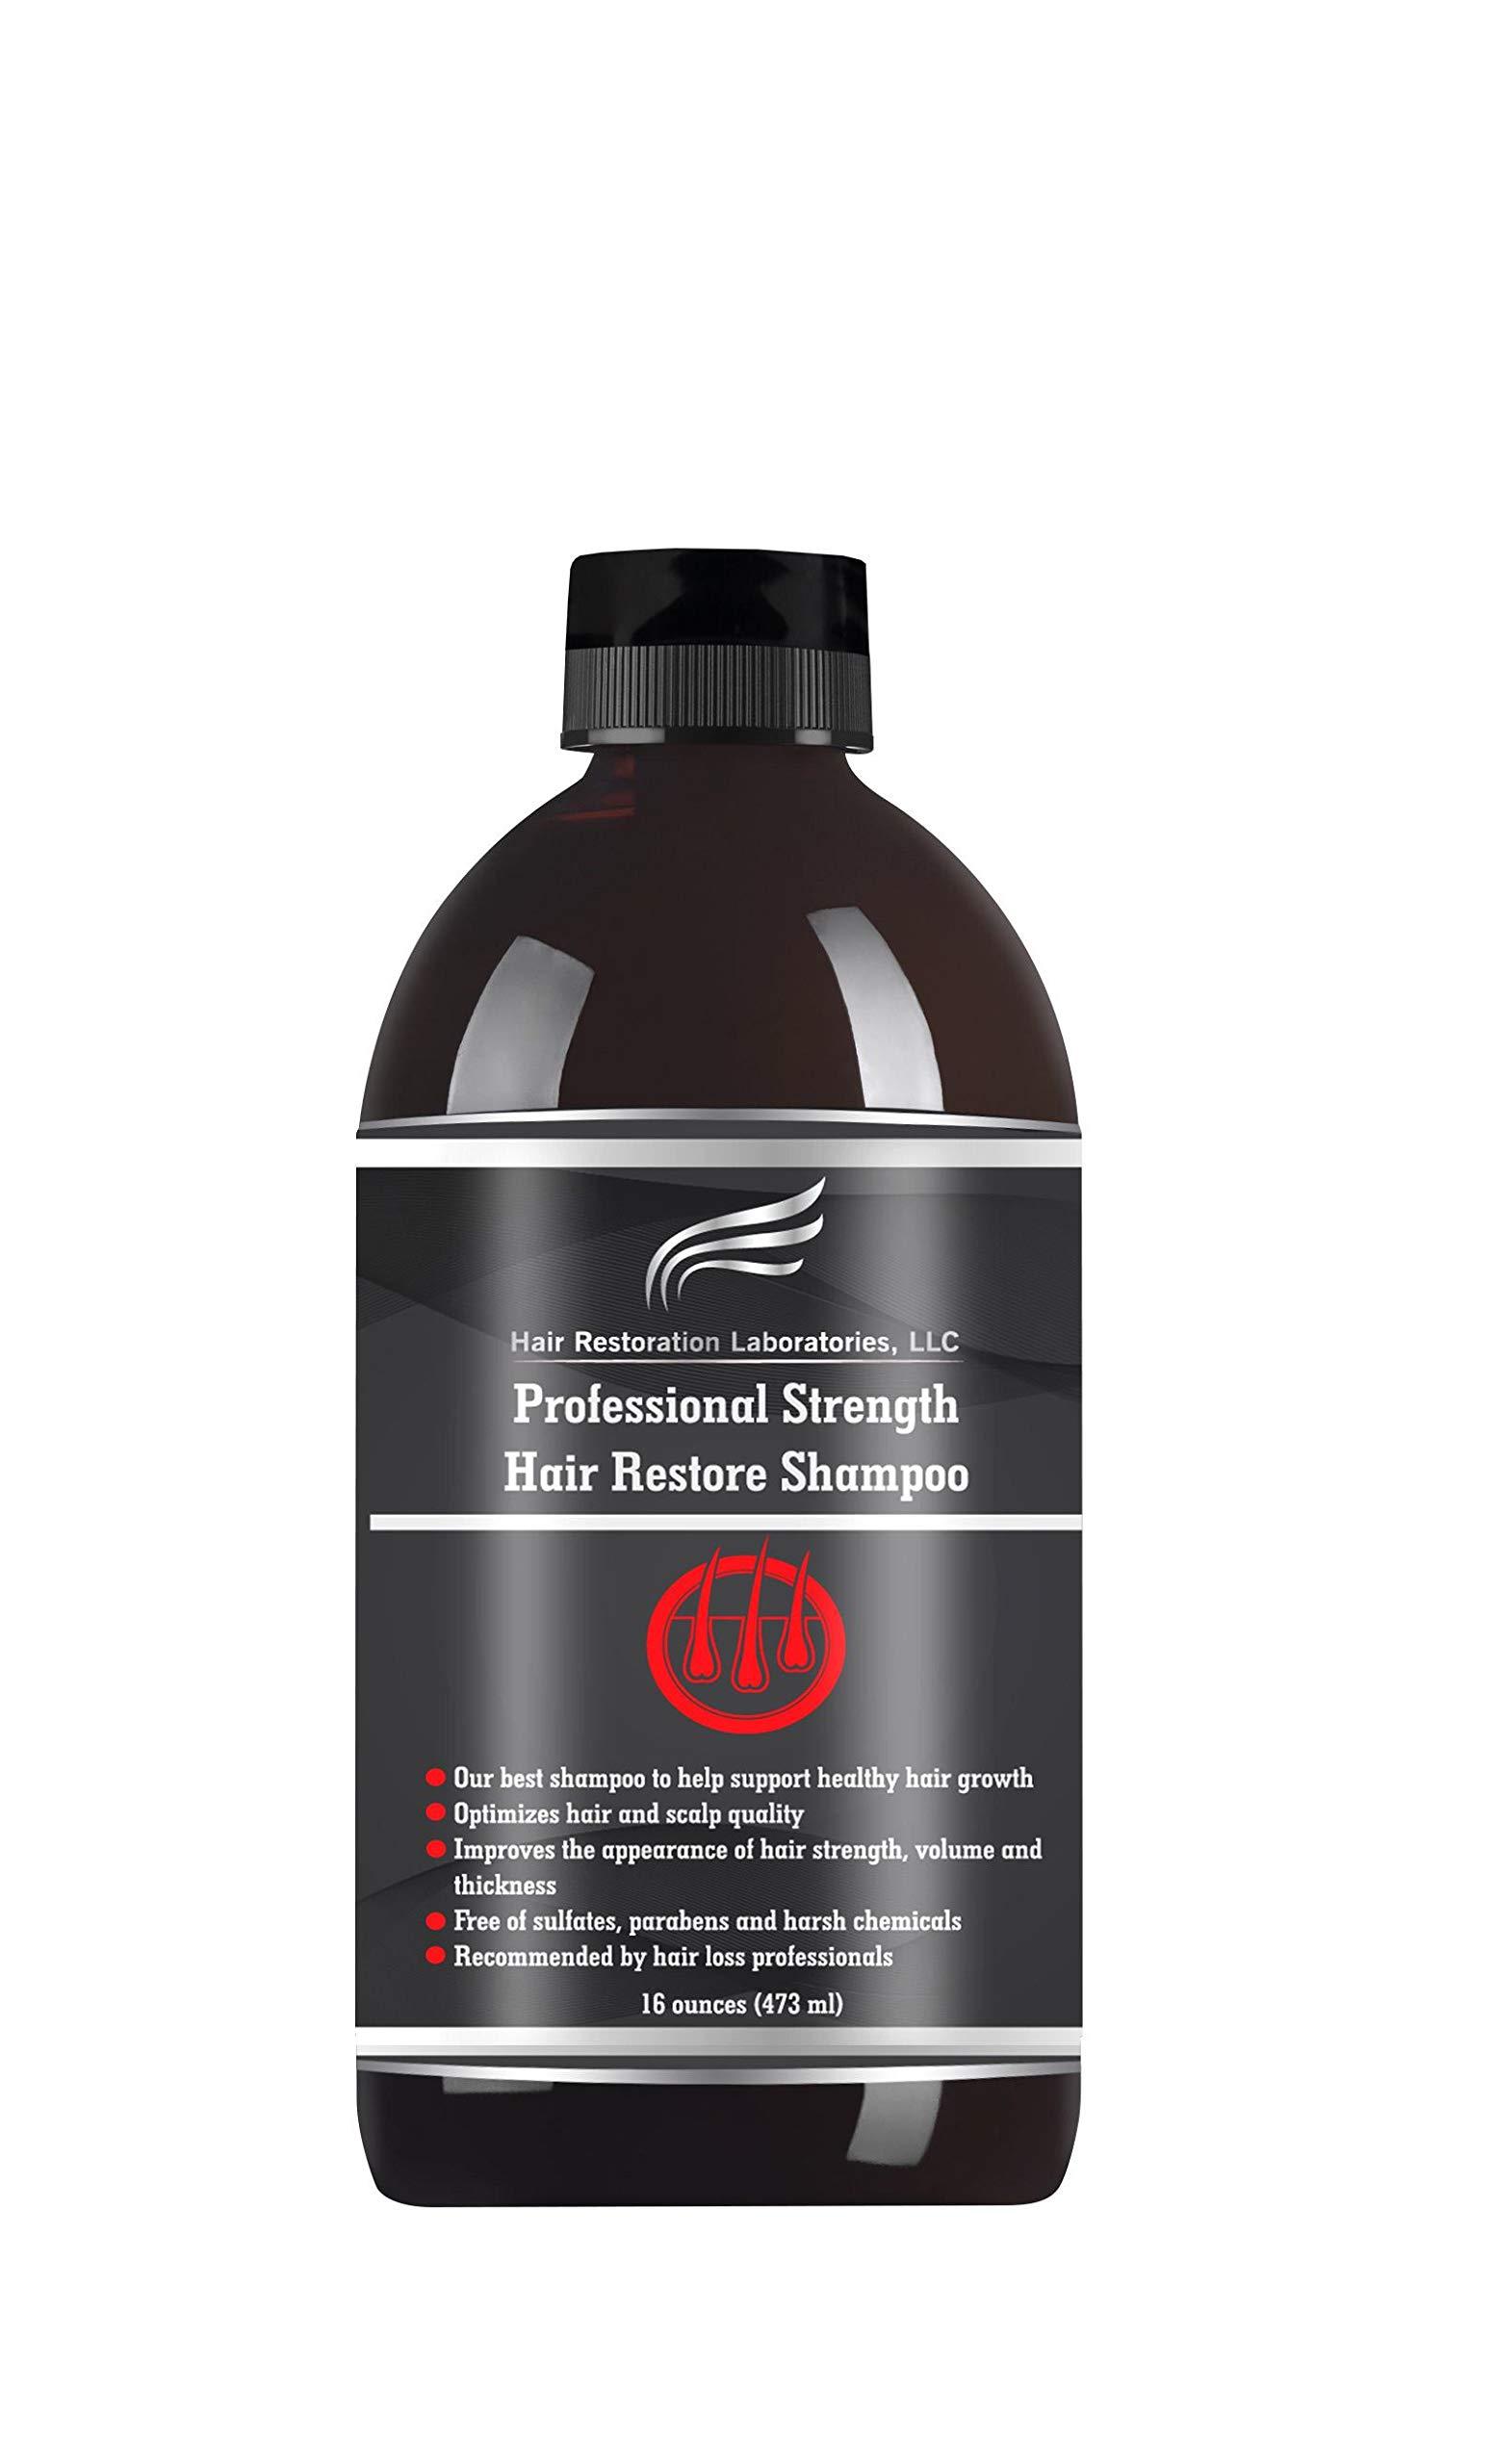 HAIR RESTORATION LABORATORIES' 2019 PROFESSIONAL STRENGTH DHT BLOCKING HAIR LOSS SHAMPOO: STRONGEST HAIR REGROWTH SHAMPOO FOR MEN & WOMEN/OVER 20 DHT BLOCKERS by Hair Restoration Laboratories, LLC